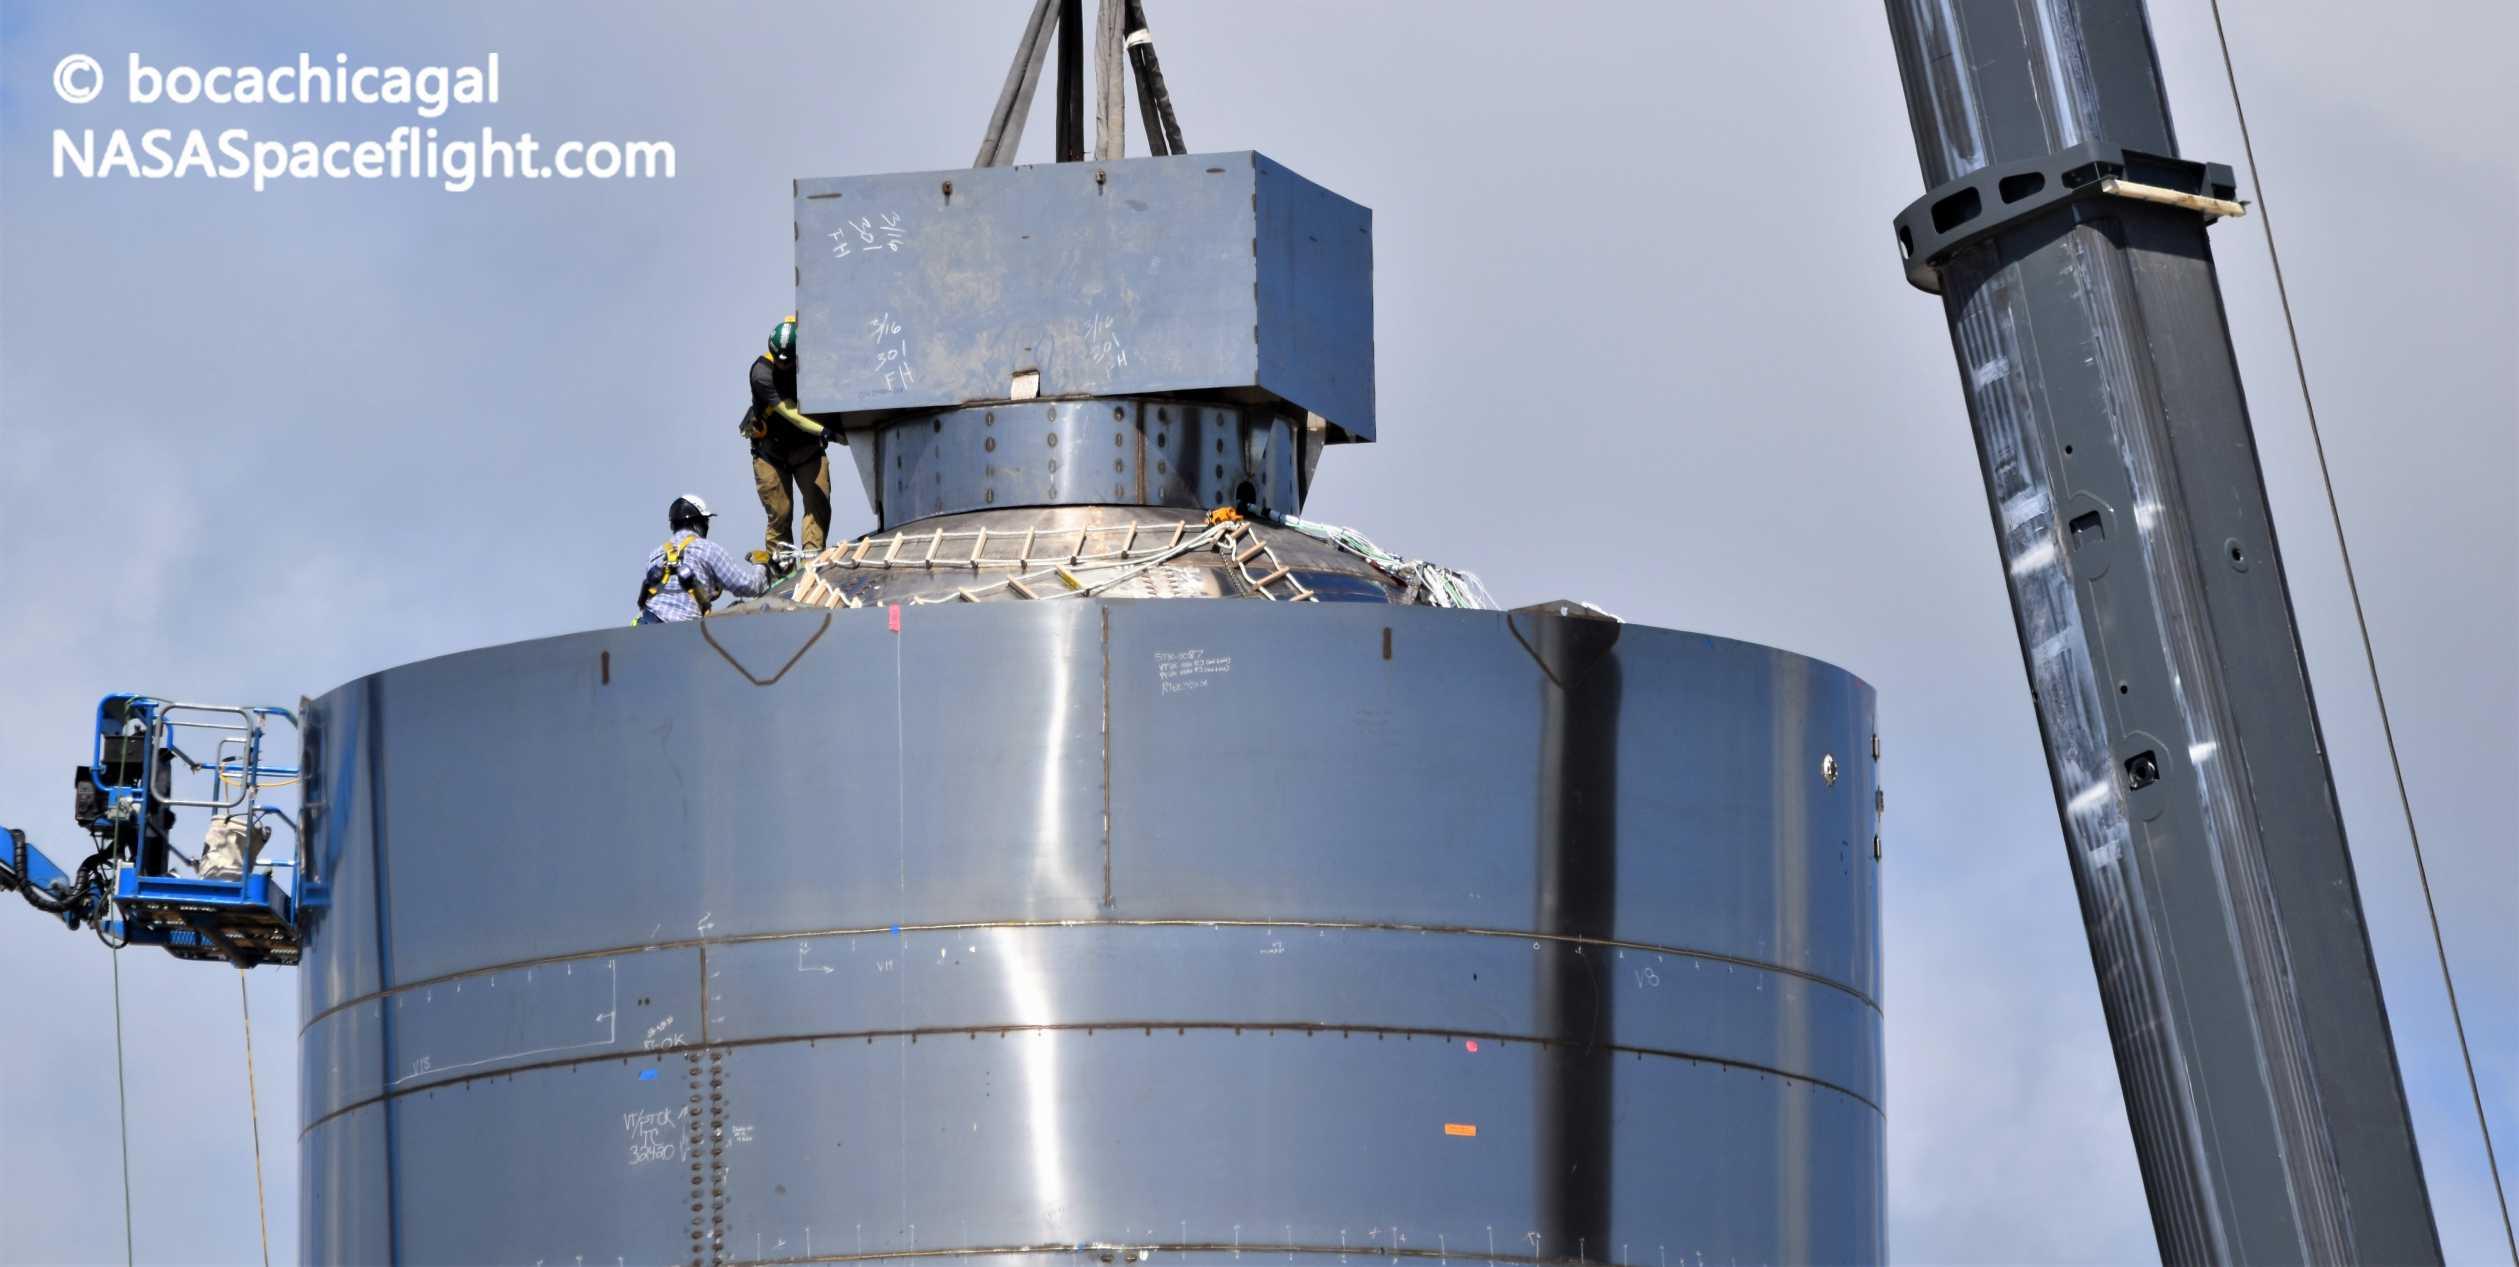 Starship Boca Chica 052720 (NASASpaceflight – bocachicagal) SN4 ballast install 8 crop(c)